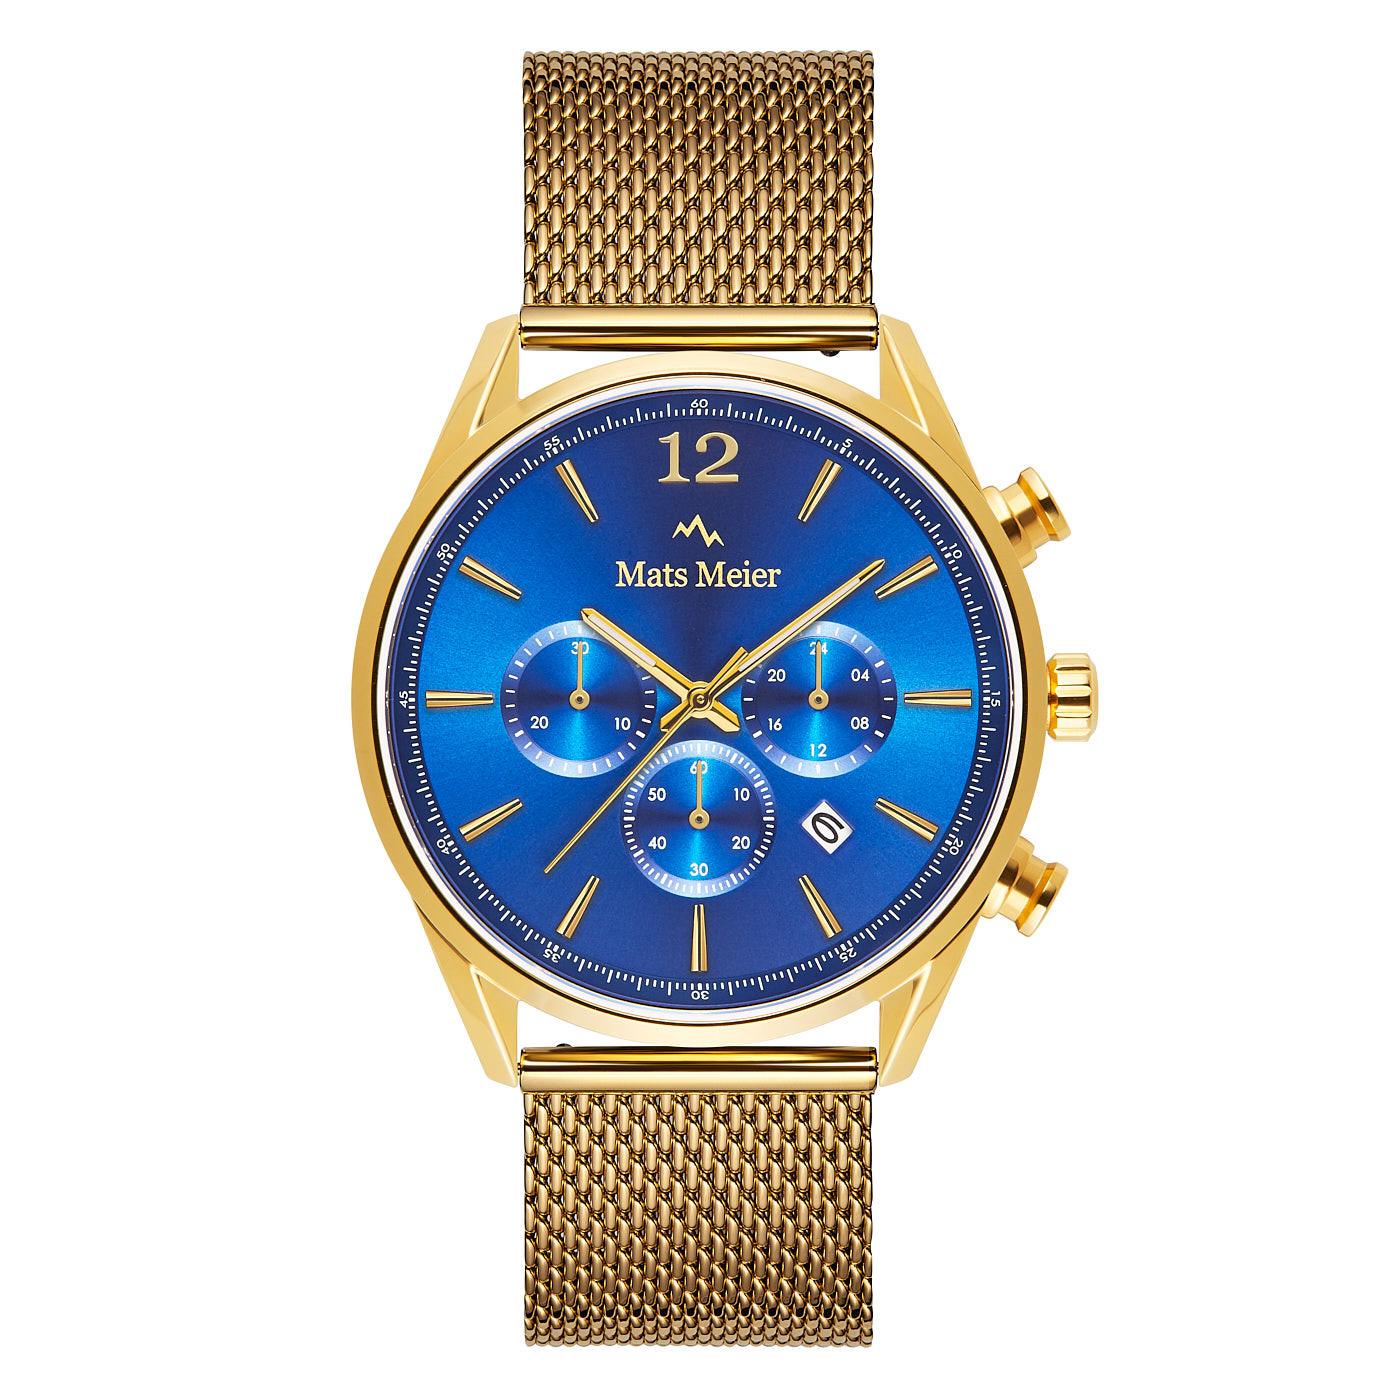 Mats Meier Grand Cornier chronograaf horloge blauw/goudkleurig mesh